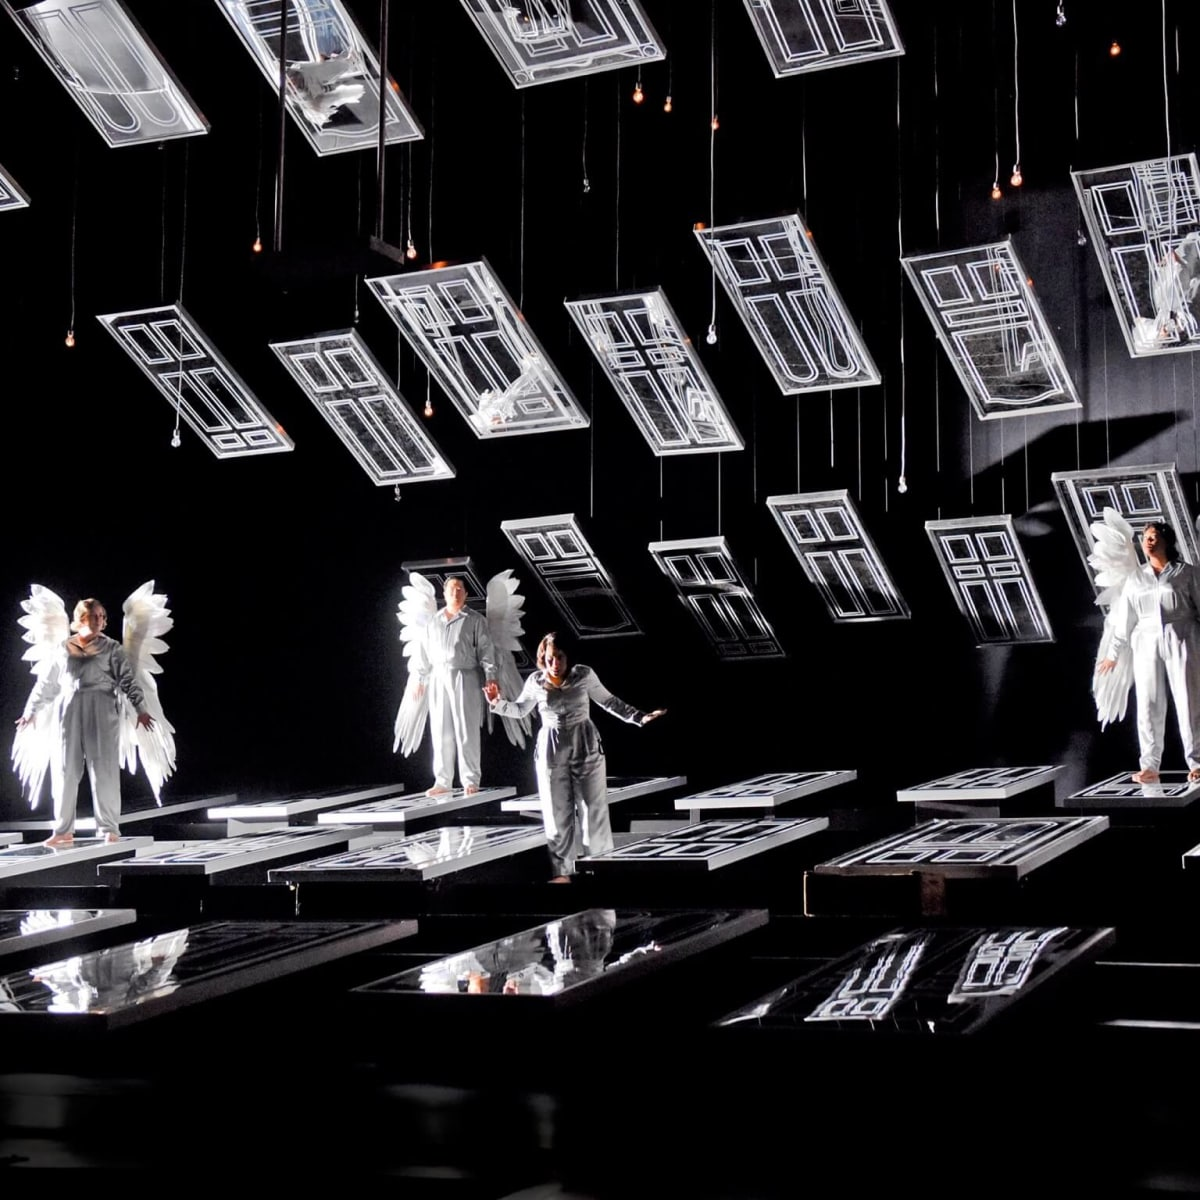 Houston Grand Opera It's A Wonderful Life angels